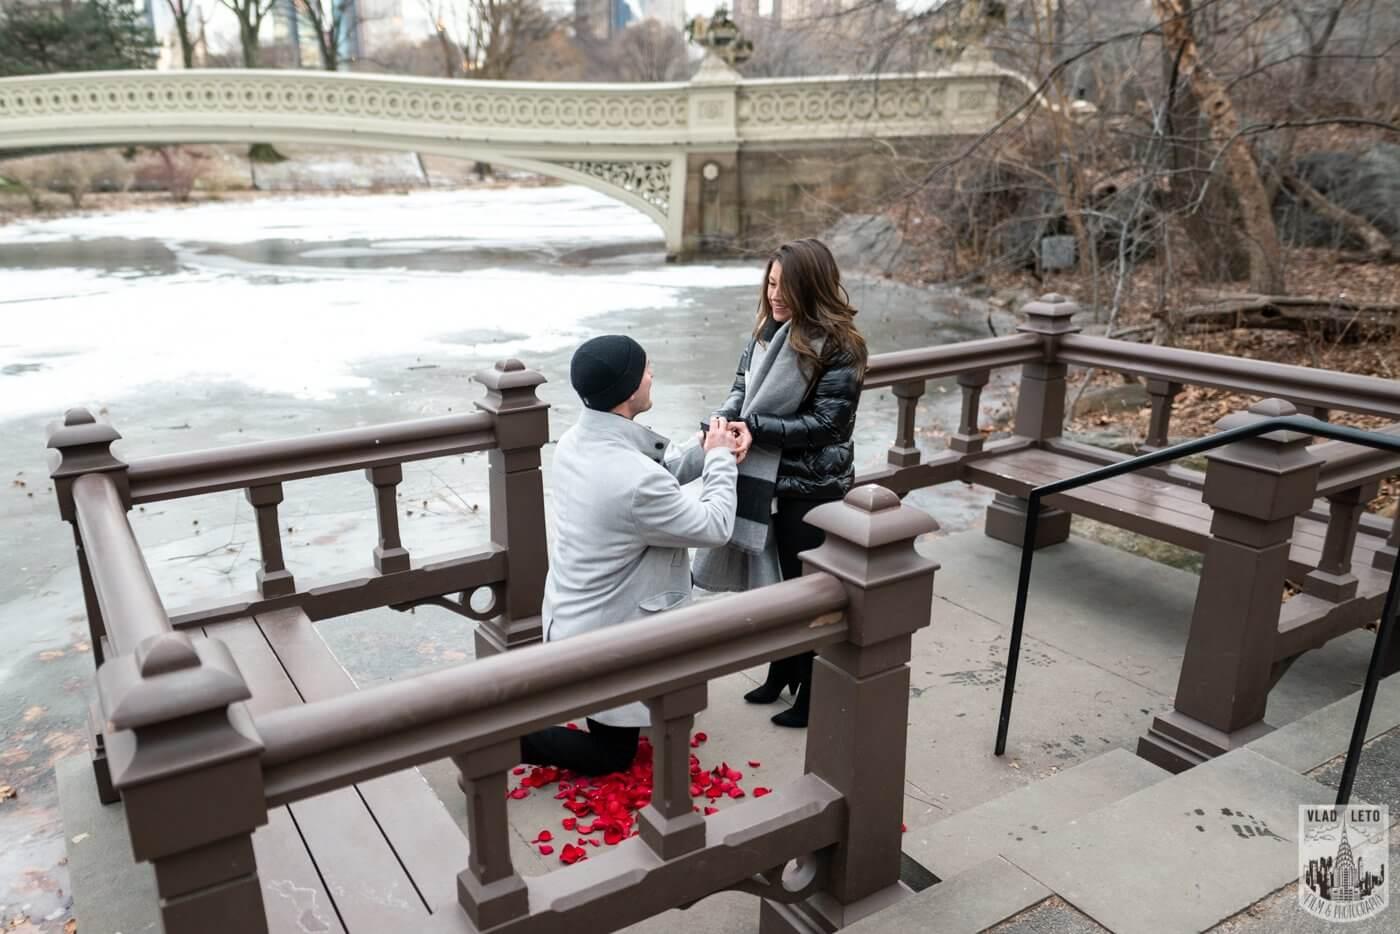 Photo 2 Bow bridge surprise marriage proposal.   VladLeto